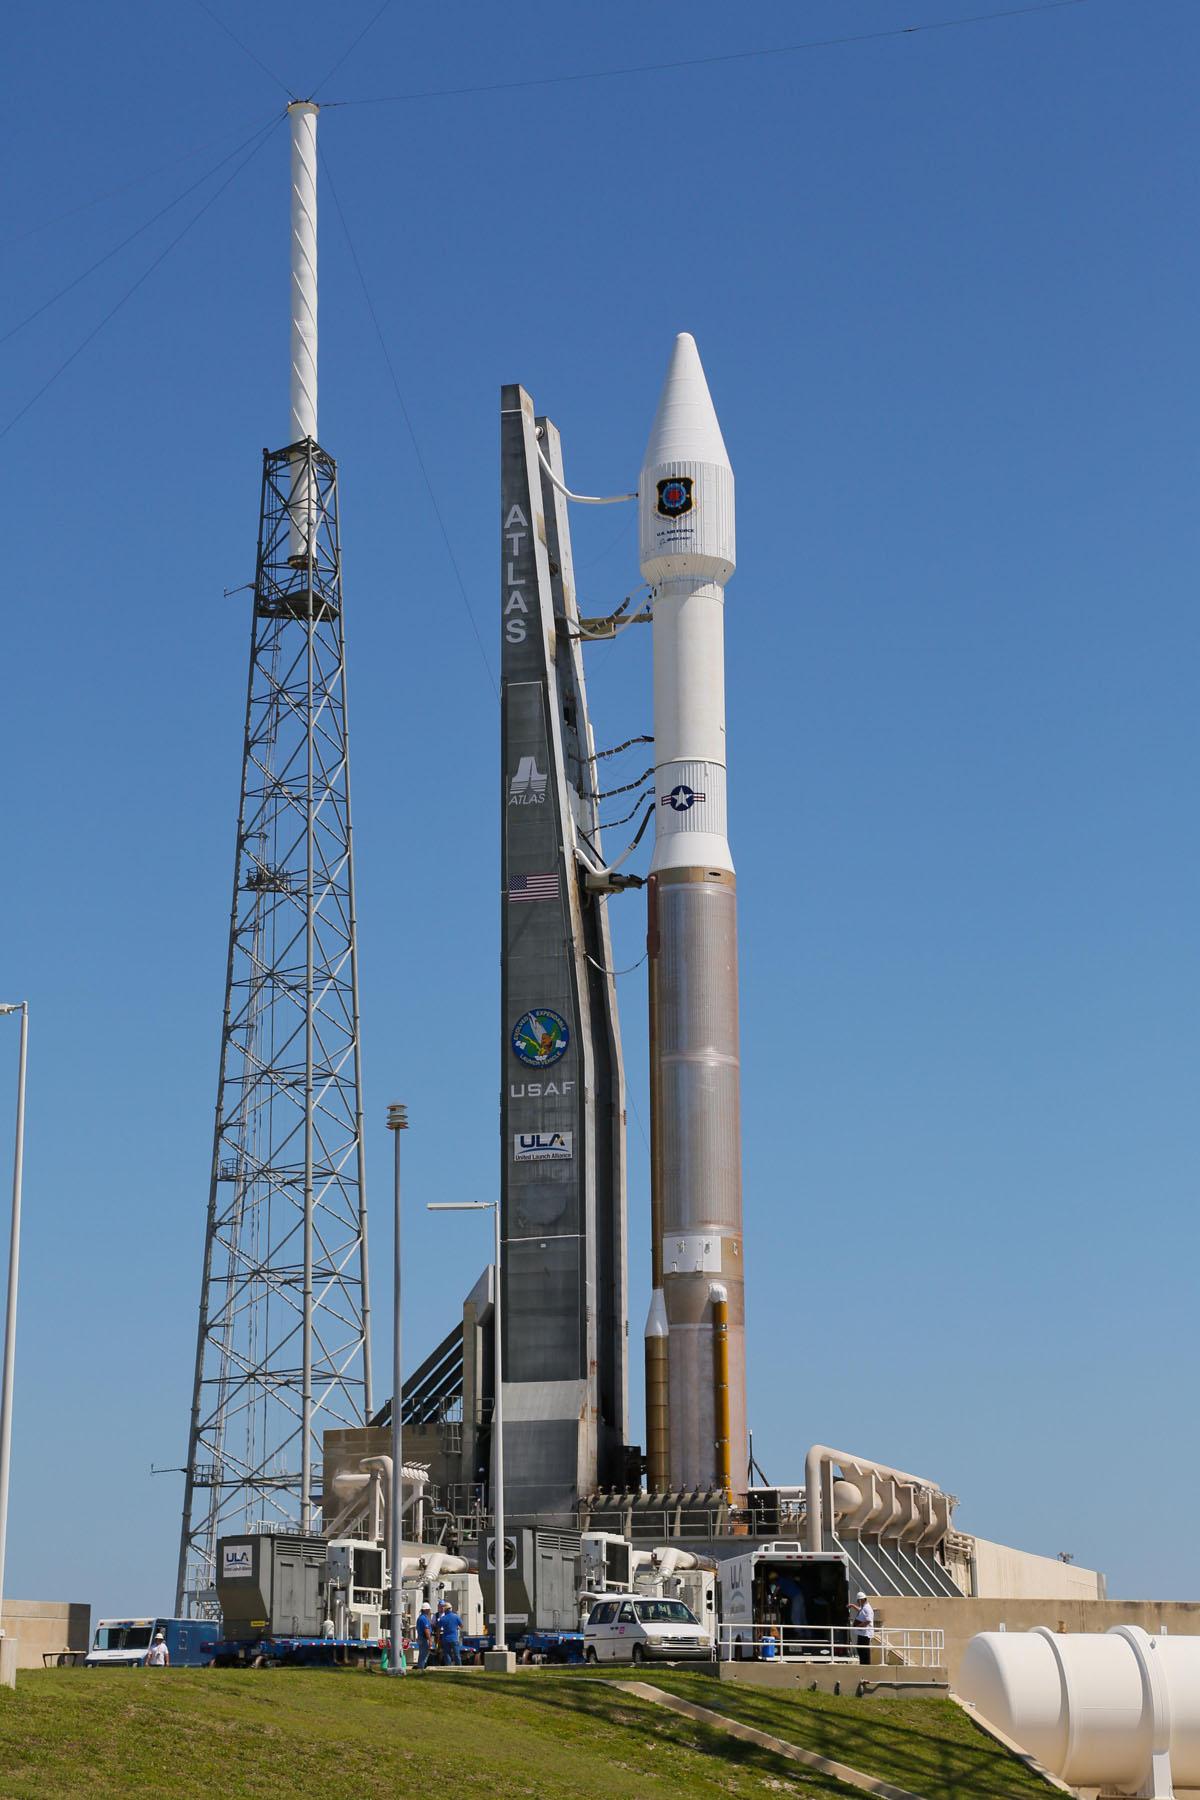 Atlas V GPS 2F-4 at the Launch Pad